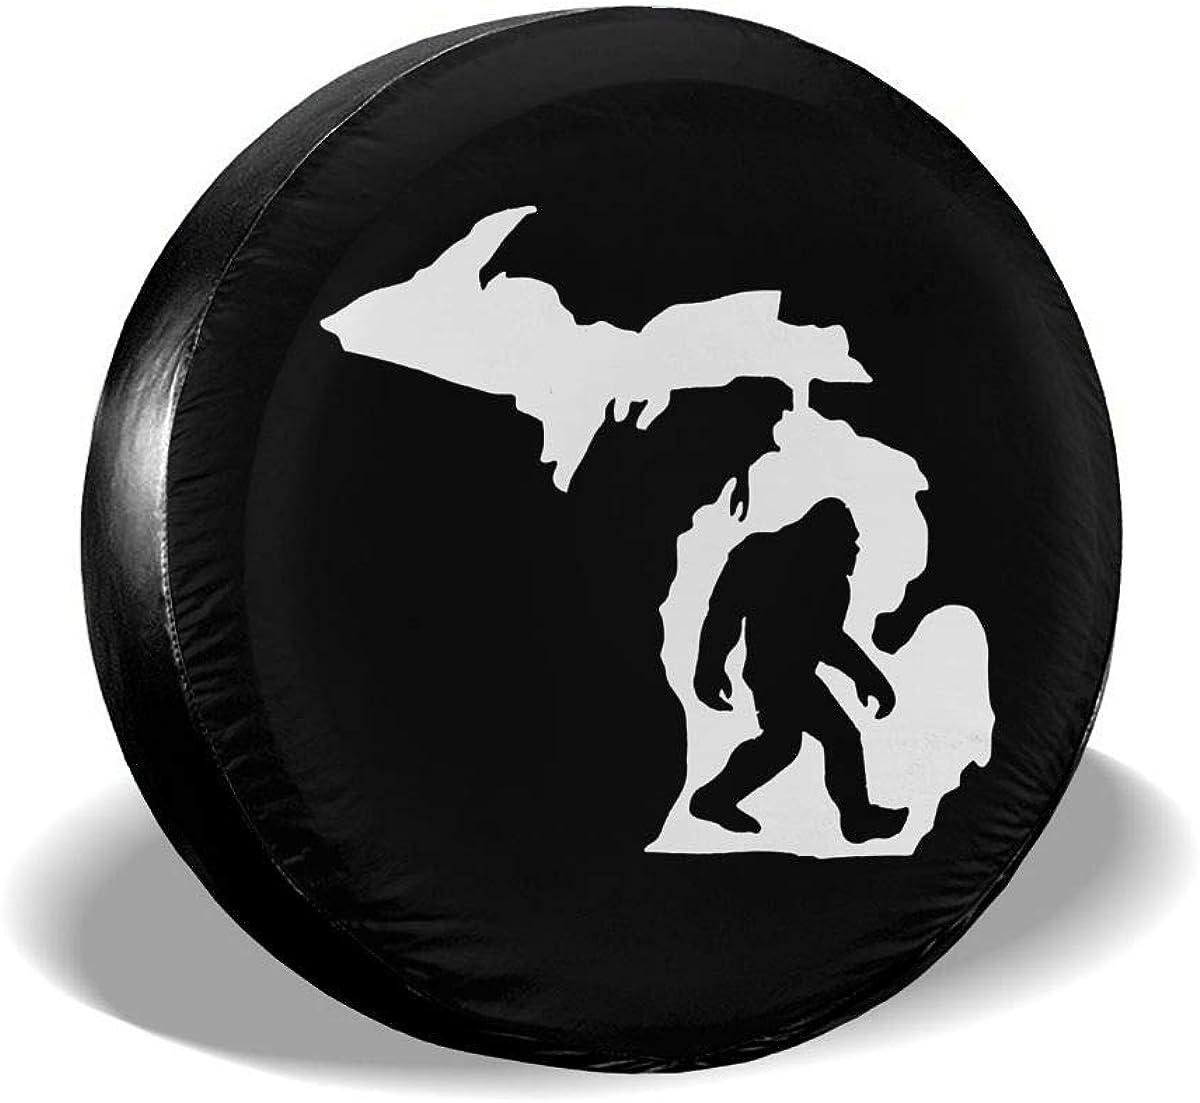 Merahans New color Michigan Map Bigfoot Spare - Tire Denver Mall Univ Cover Waterproof